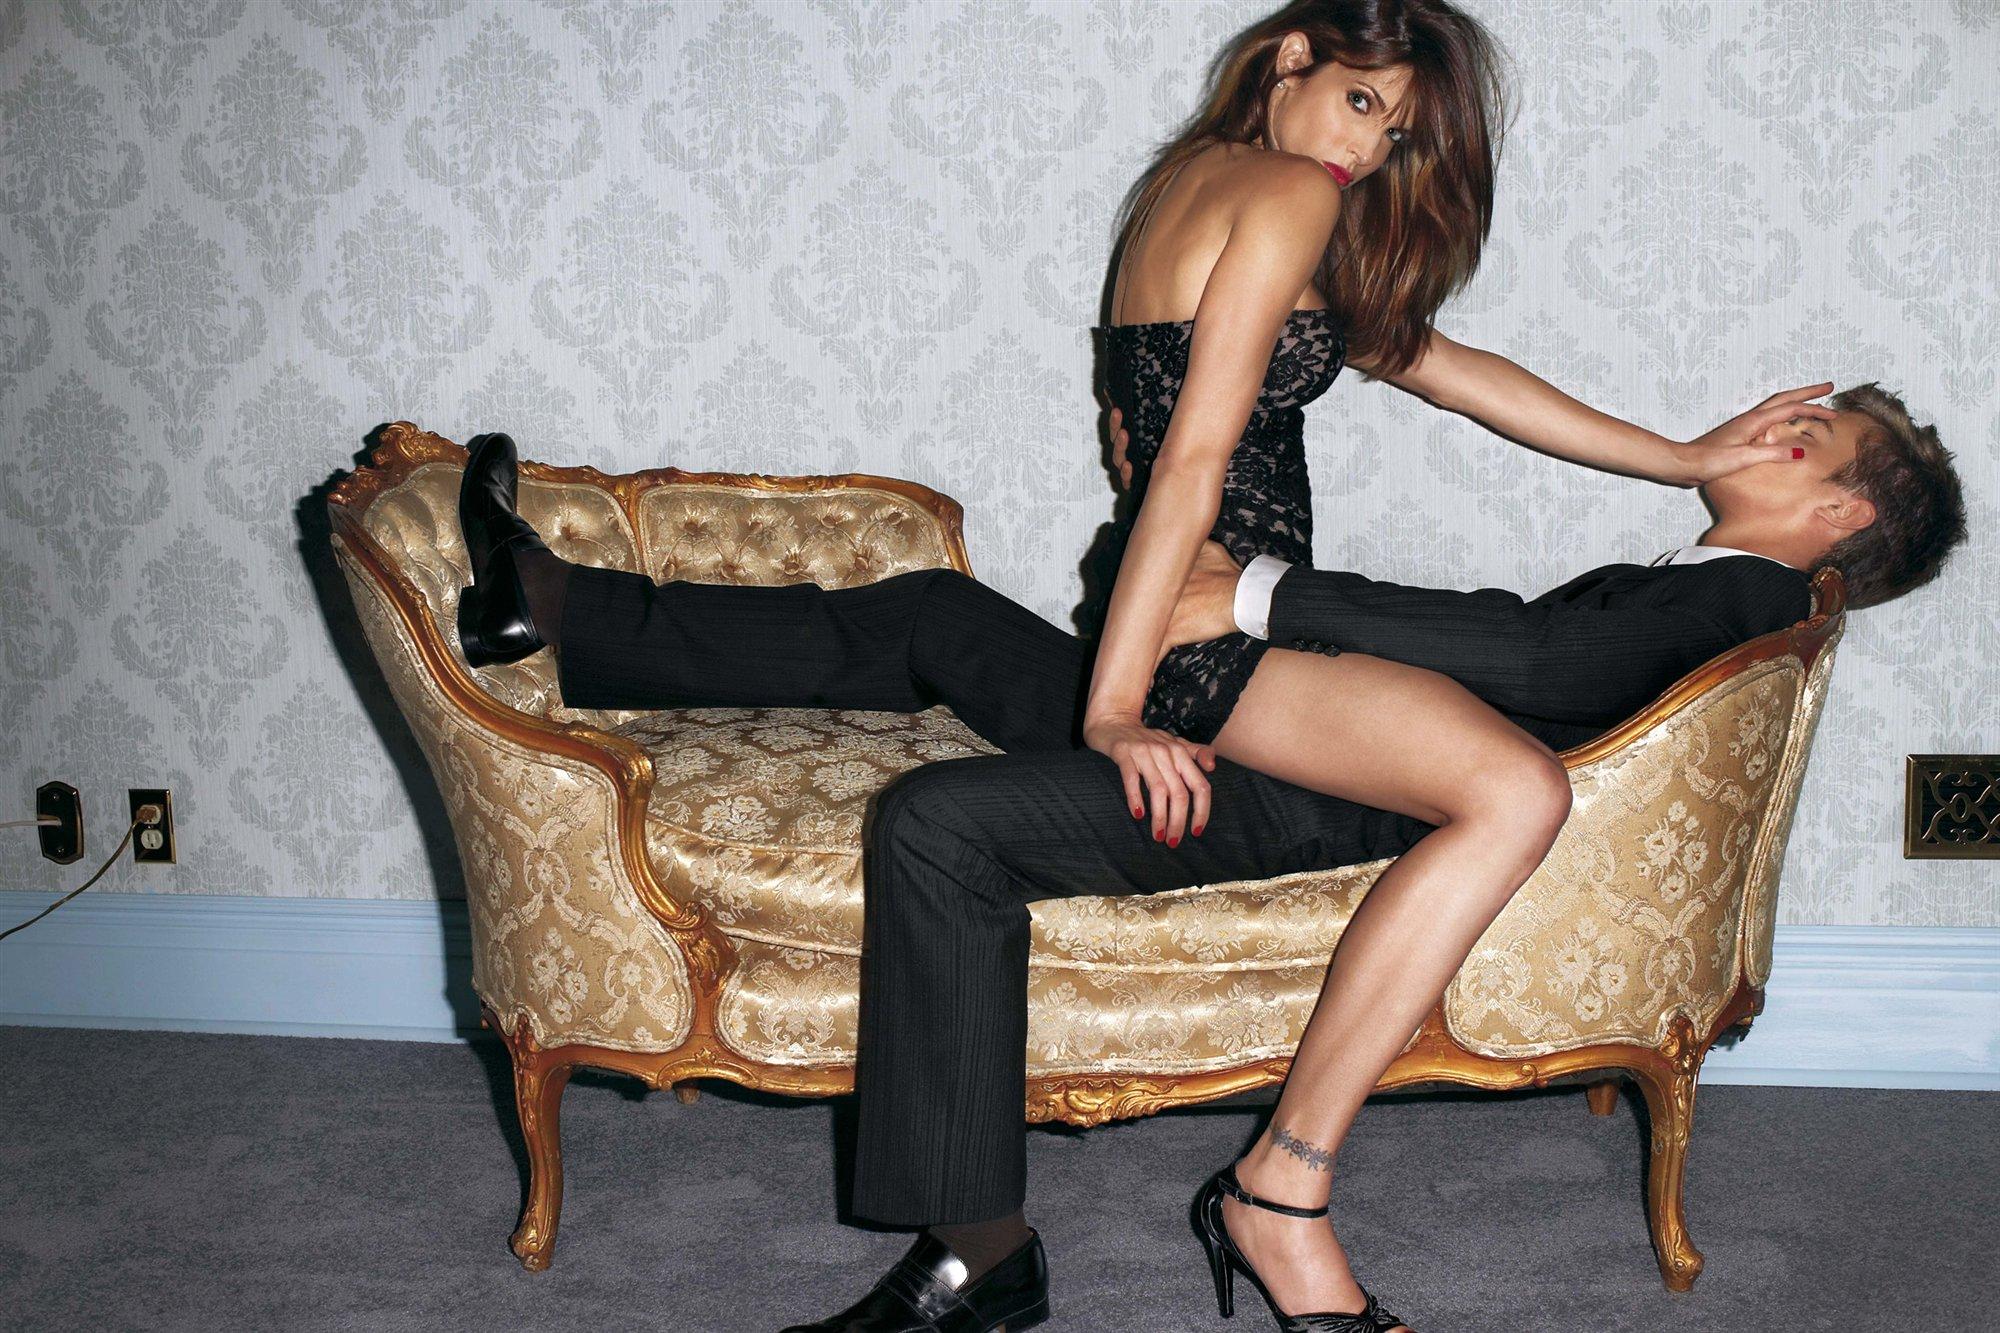 Woman dominates man sex picture nackt comics